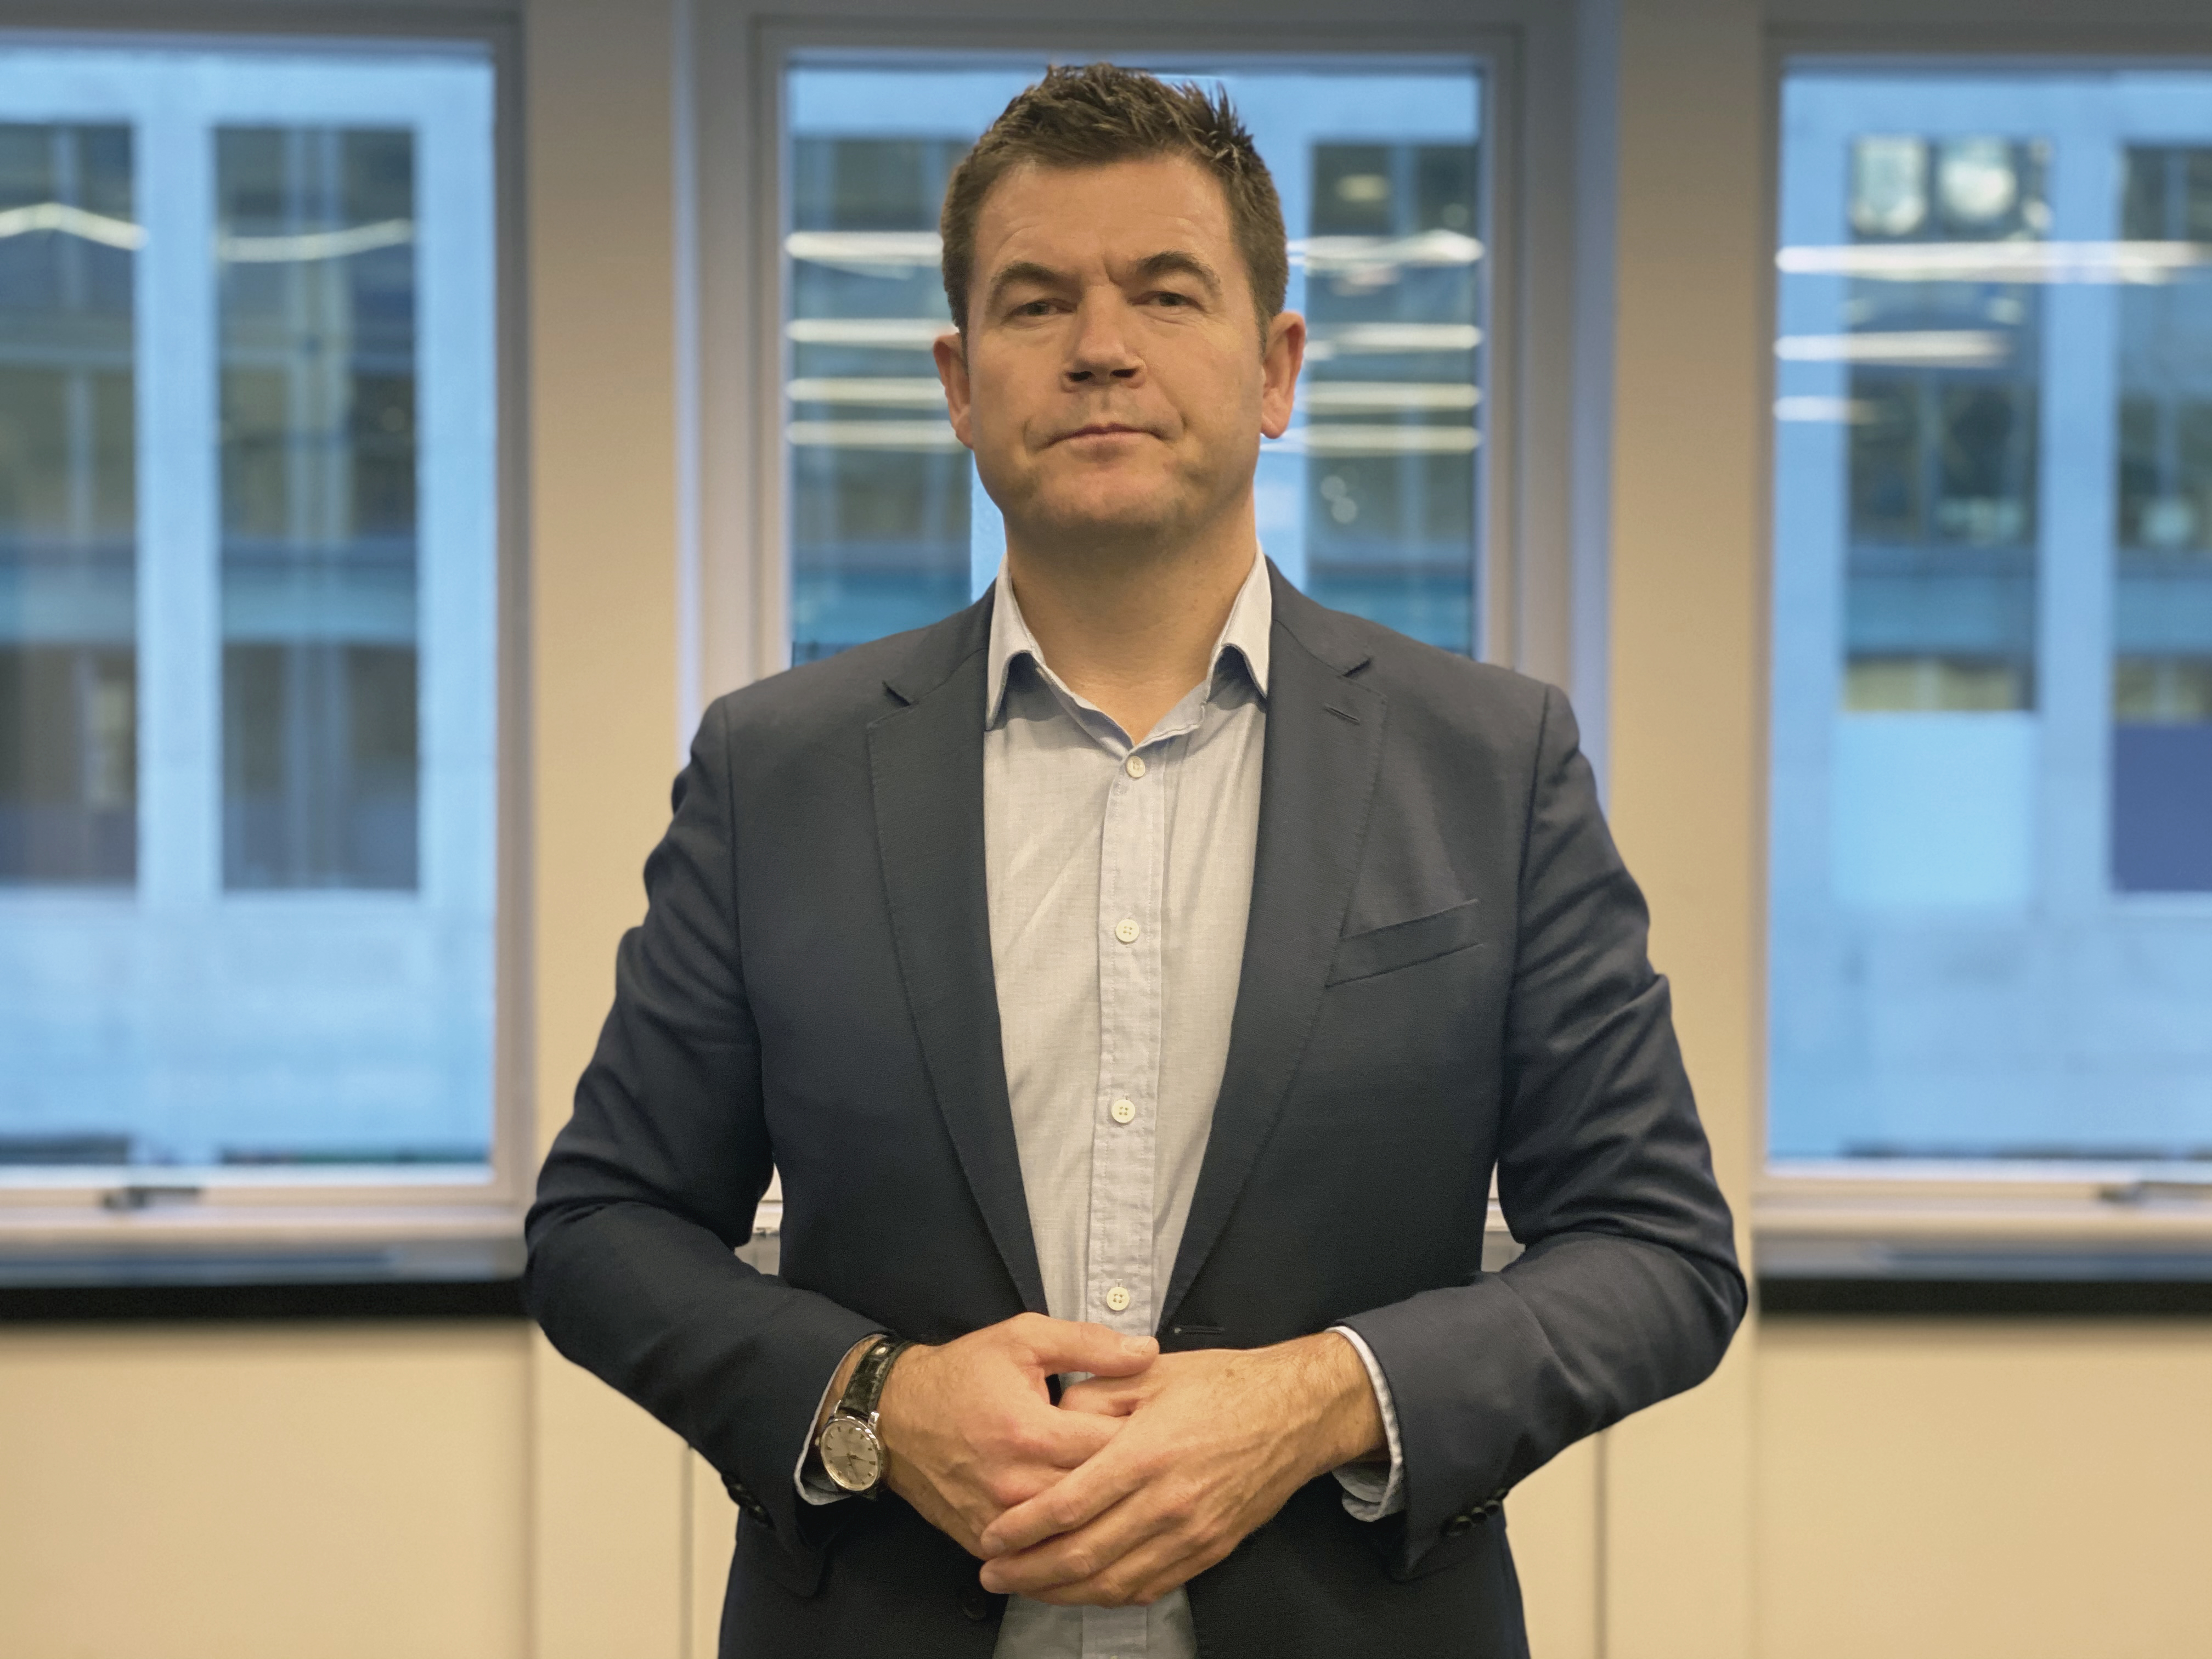 Forhandler Jan Olav Birkenhagen